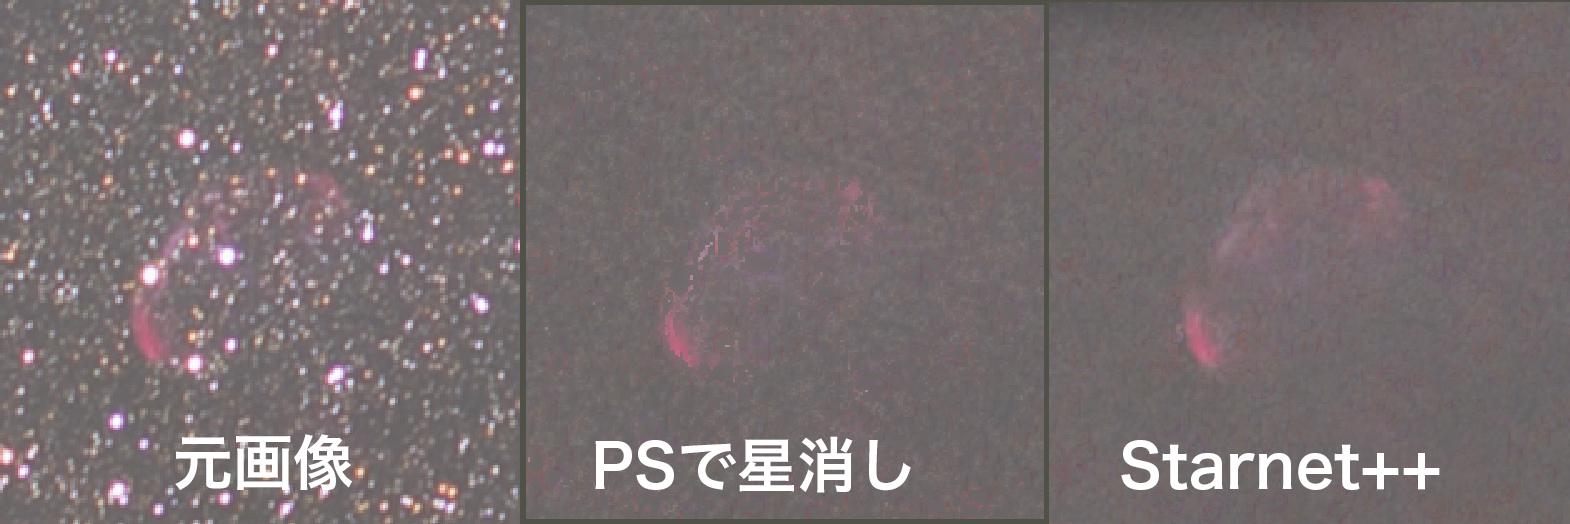 f:id:snct-astro:20190720023141j:plain